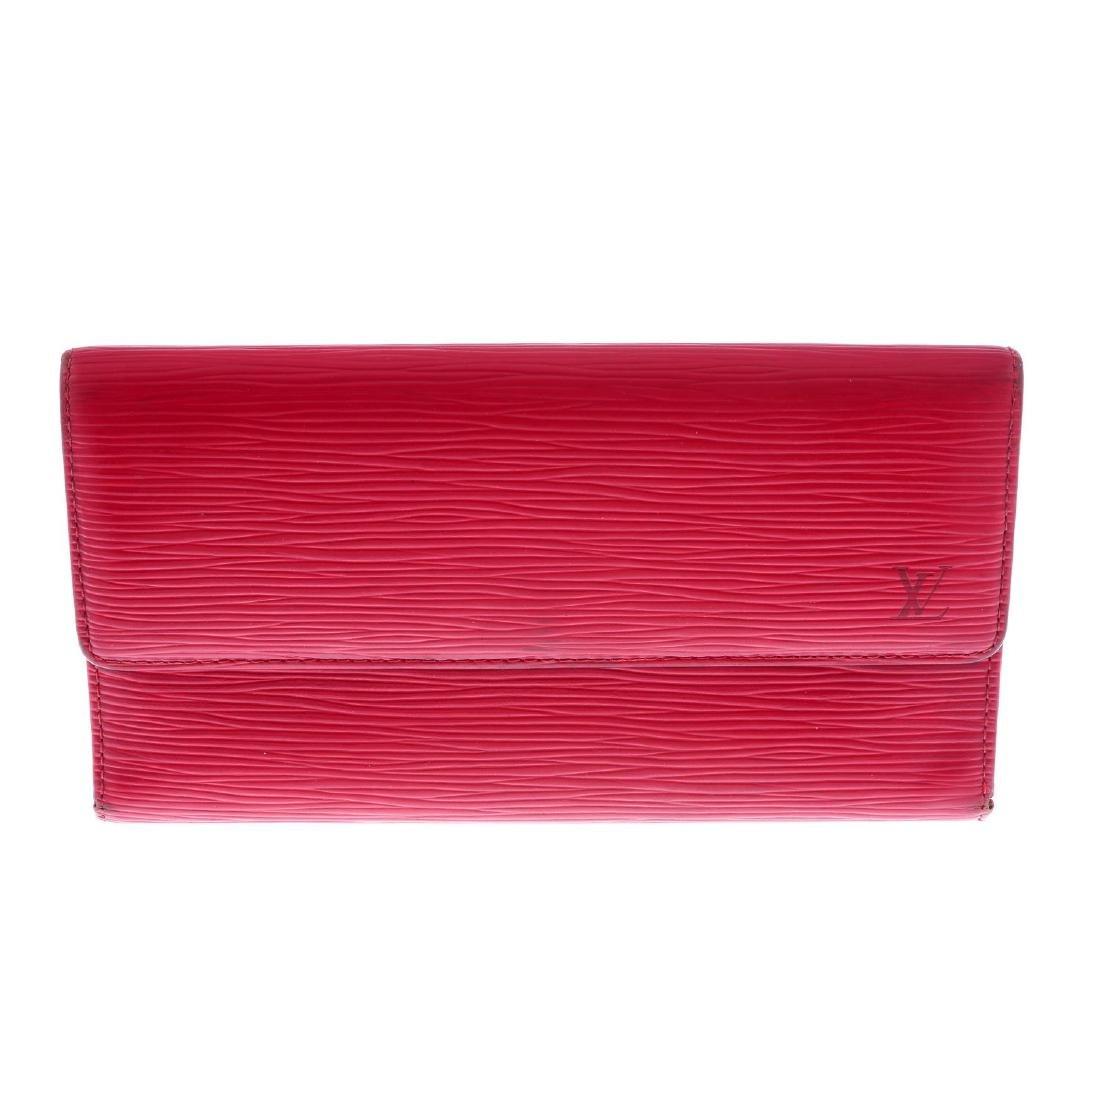 LOUIS VUITTON - a red Epi Porte Tresor International